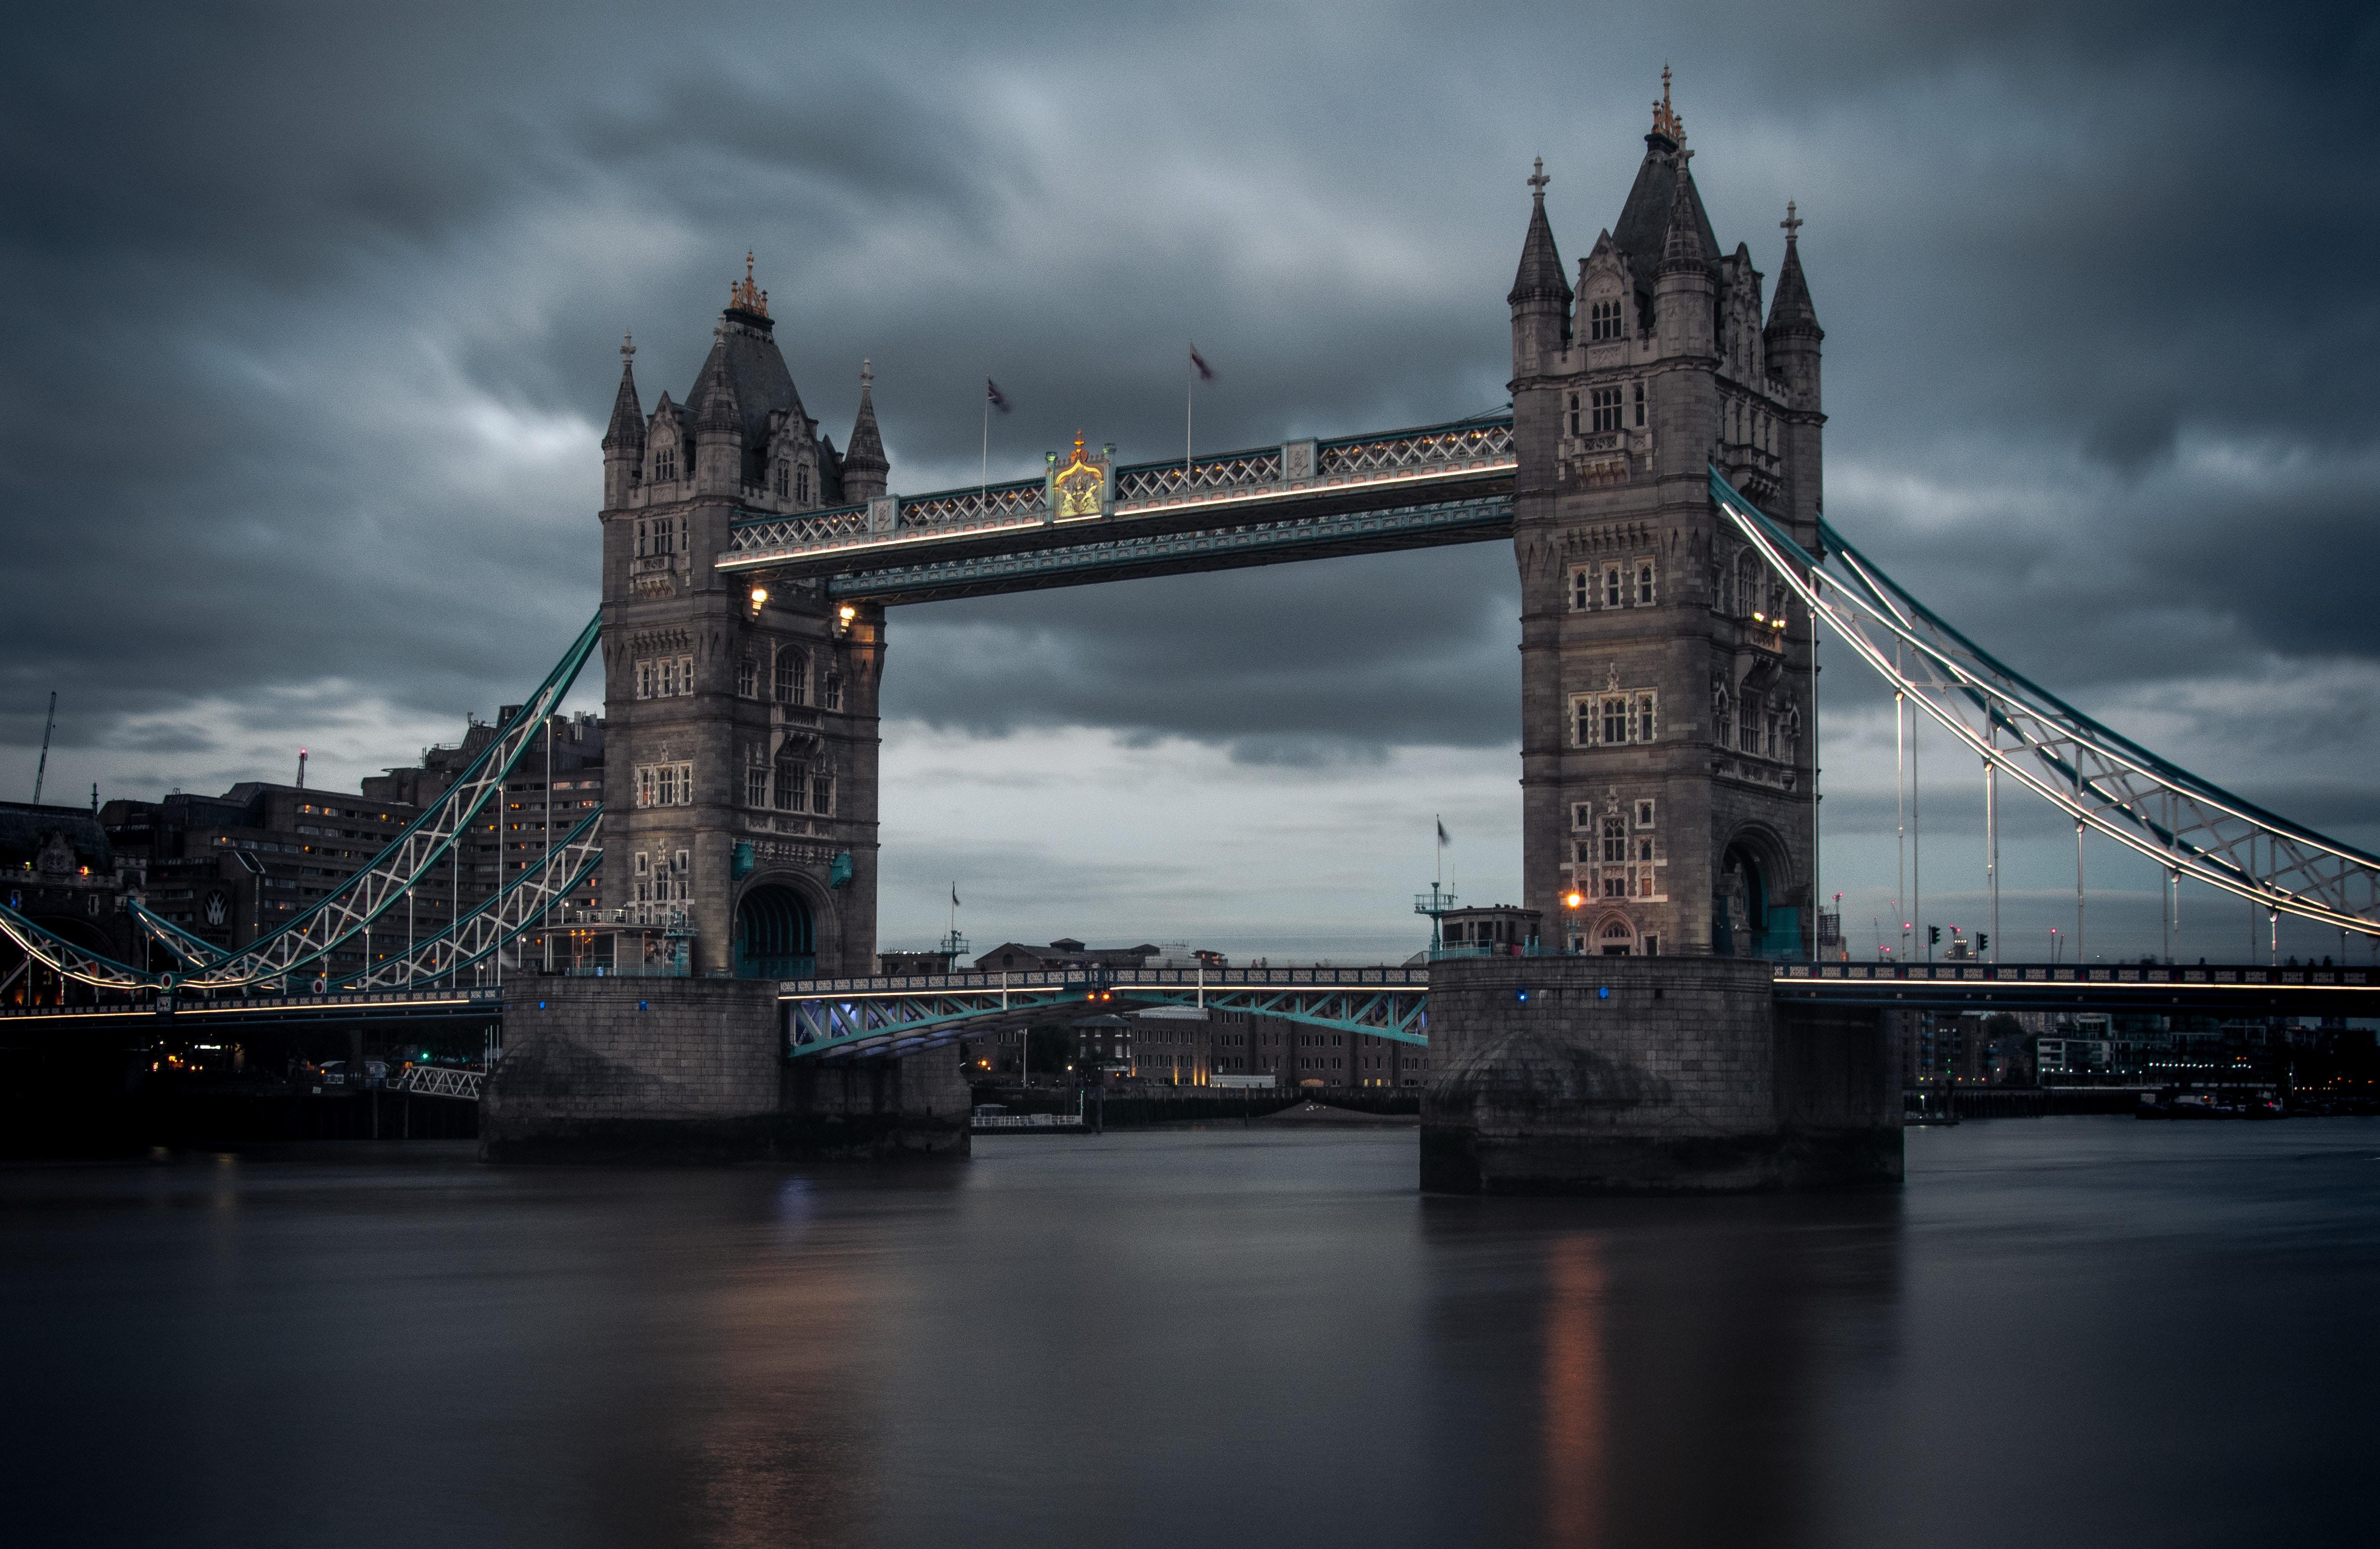 Tower Bridge, London - Credits: Lachlan Gowen, Unsplash